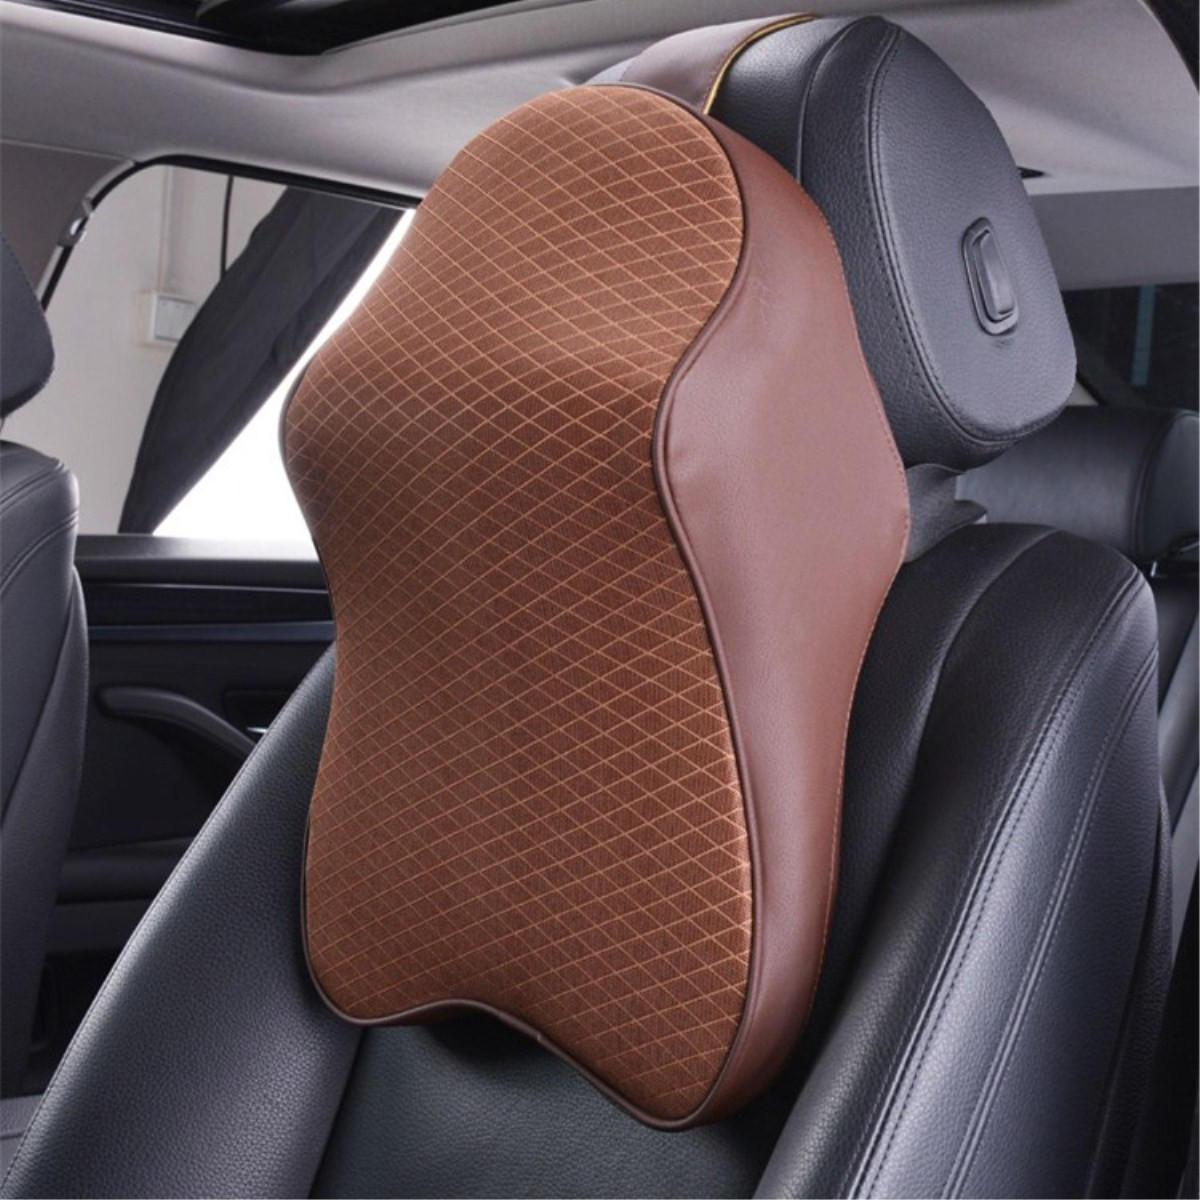 Black Long Travel Pillow for Car Seat Headrest Comfortable Computer Chair Head Cushion Timorn Memory Foam Car Headrest Cushion Neck Support Pillow